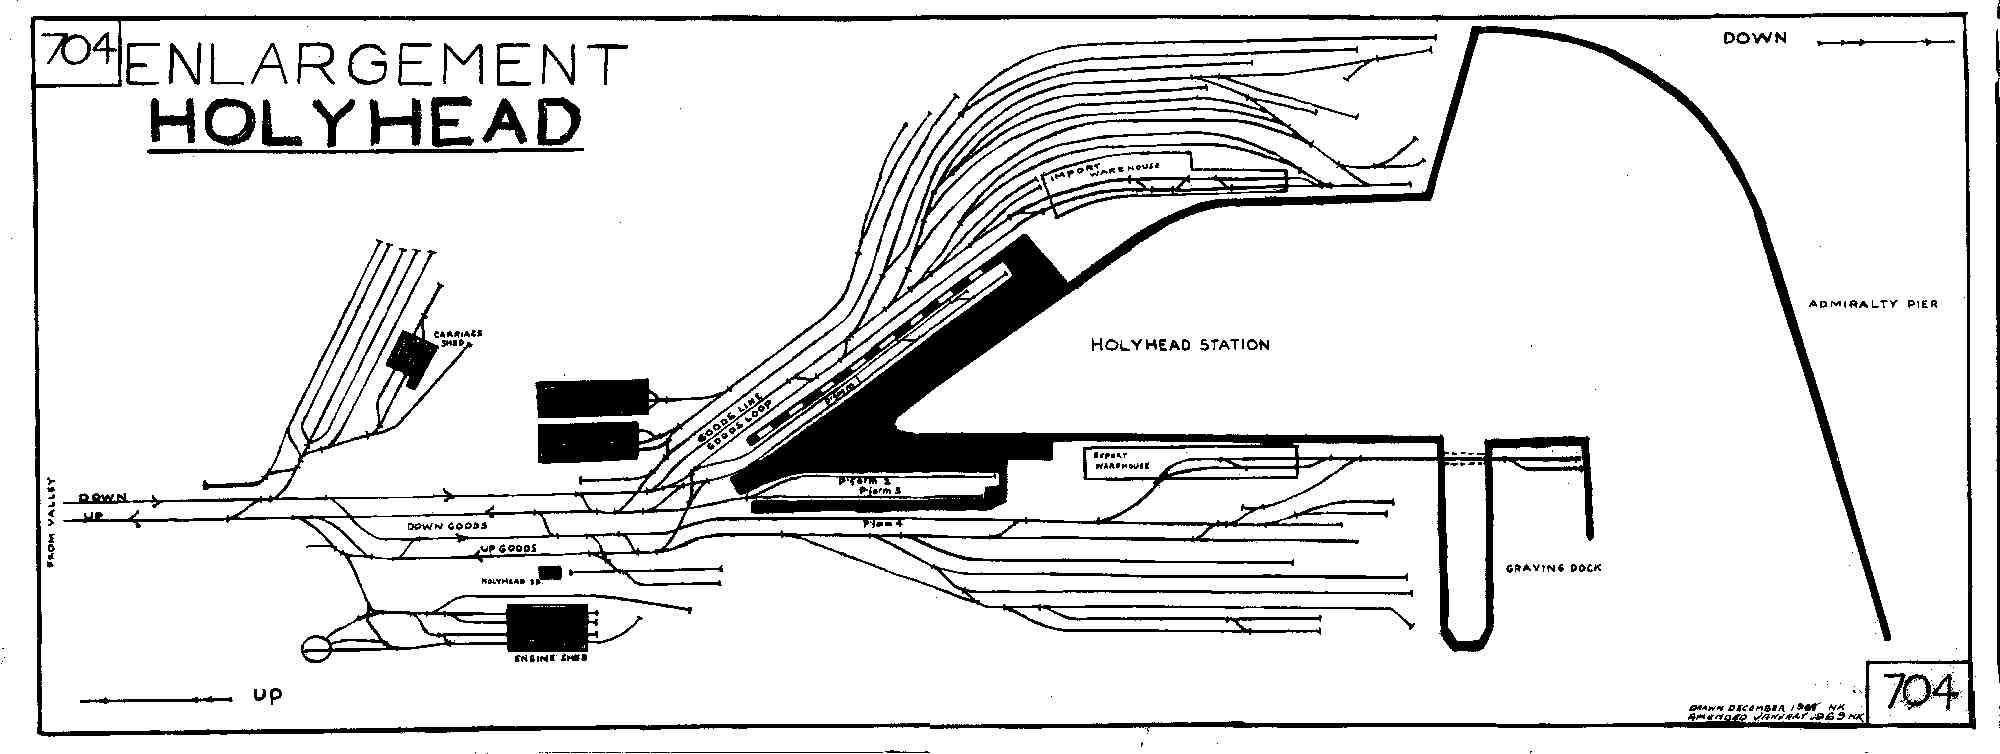 holyhead track diagram. Black Bedroom Furniture Sets. Home Design Ideas